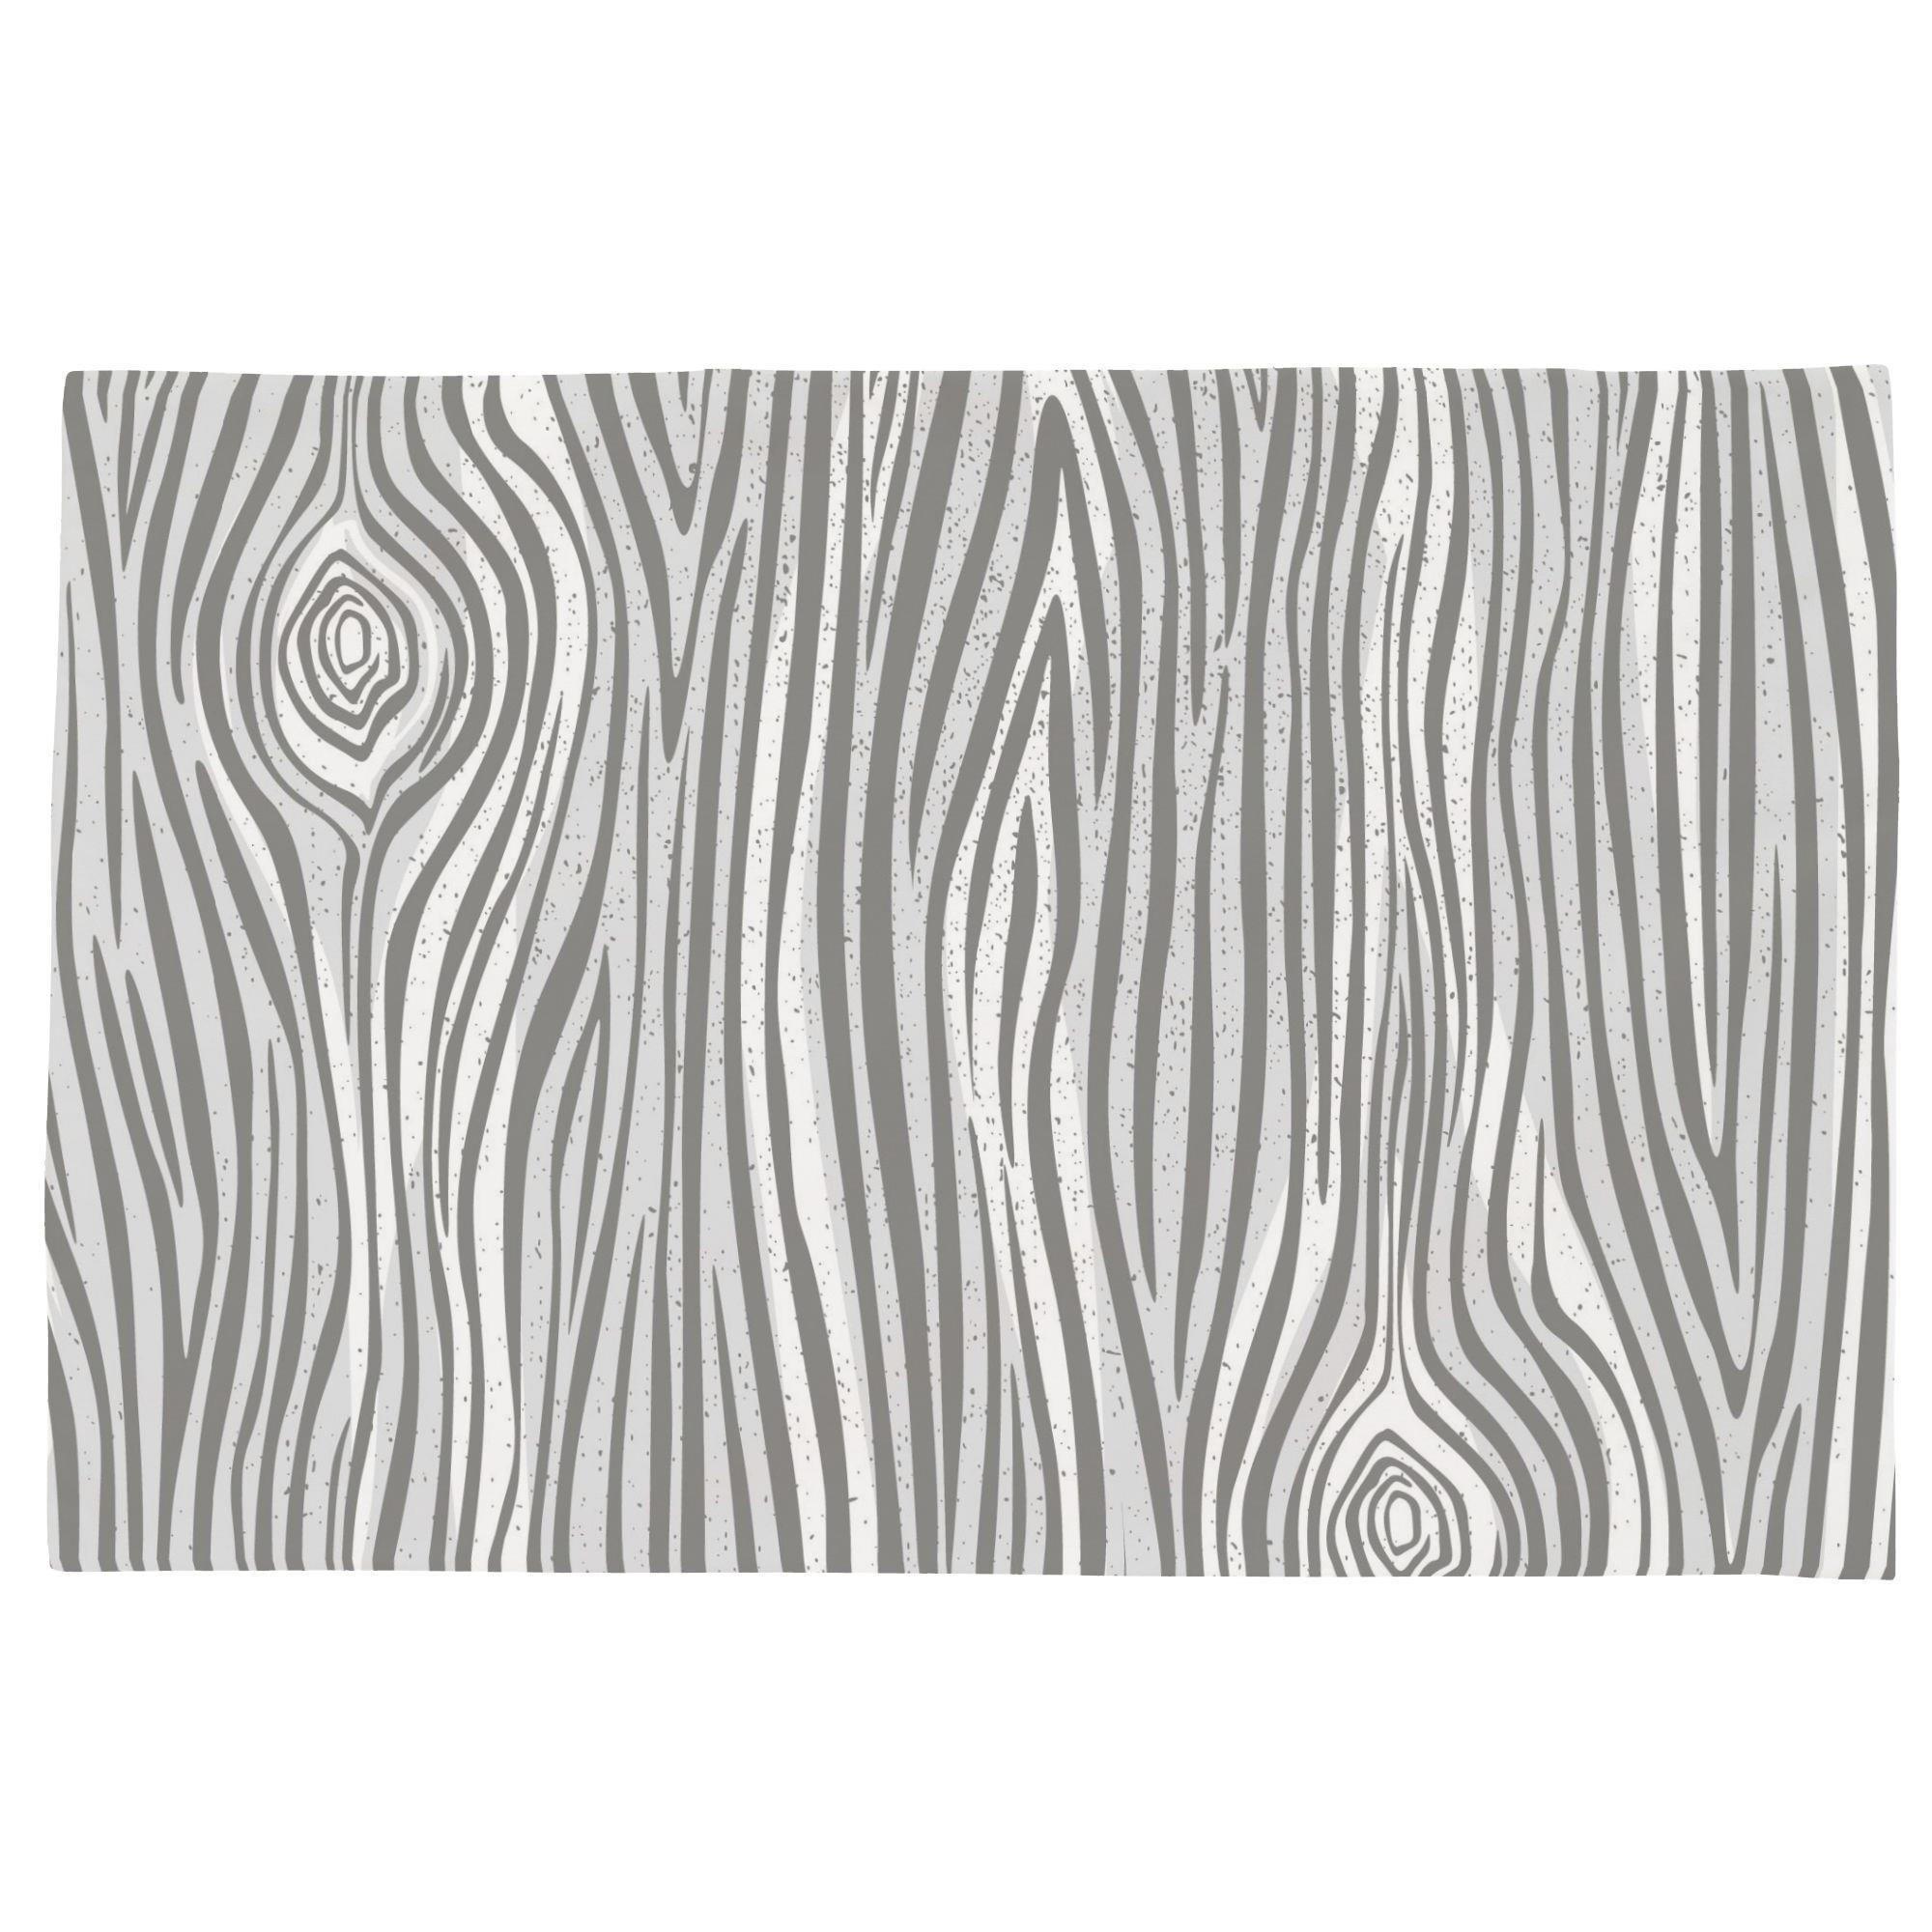 Carousel Designs Gray Large Woodgrain Toddler Bed Pillow Case